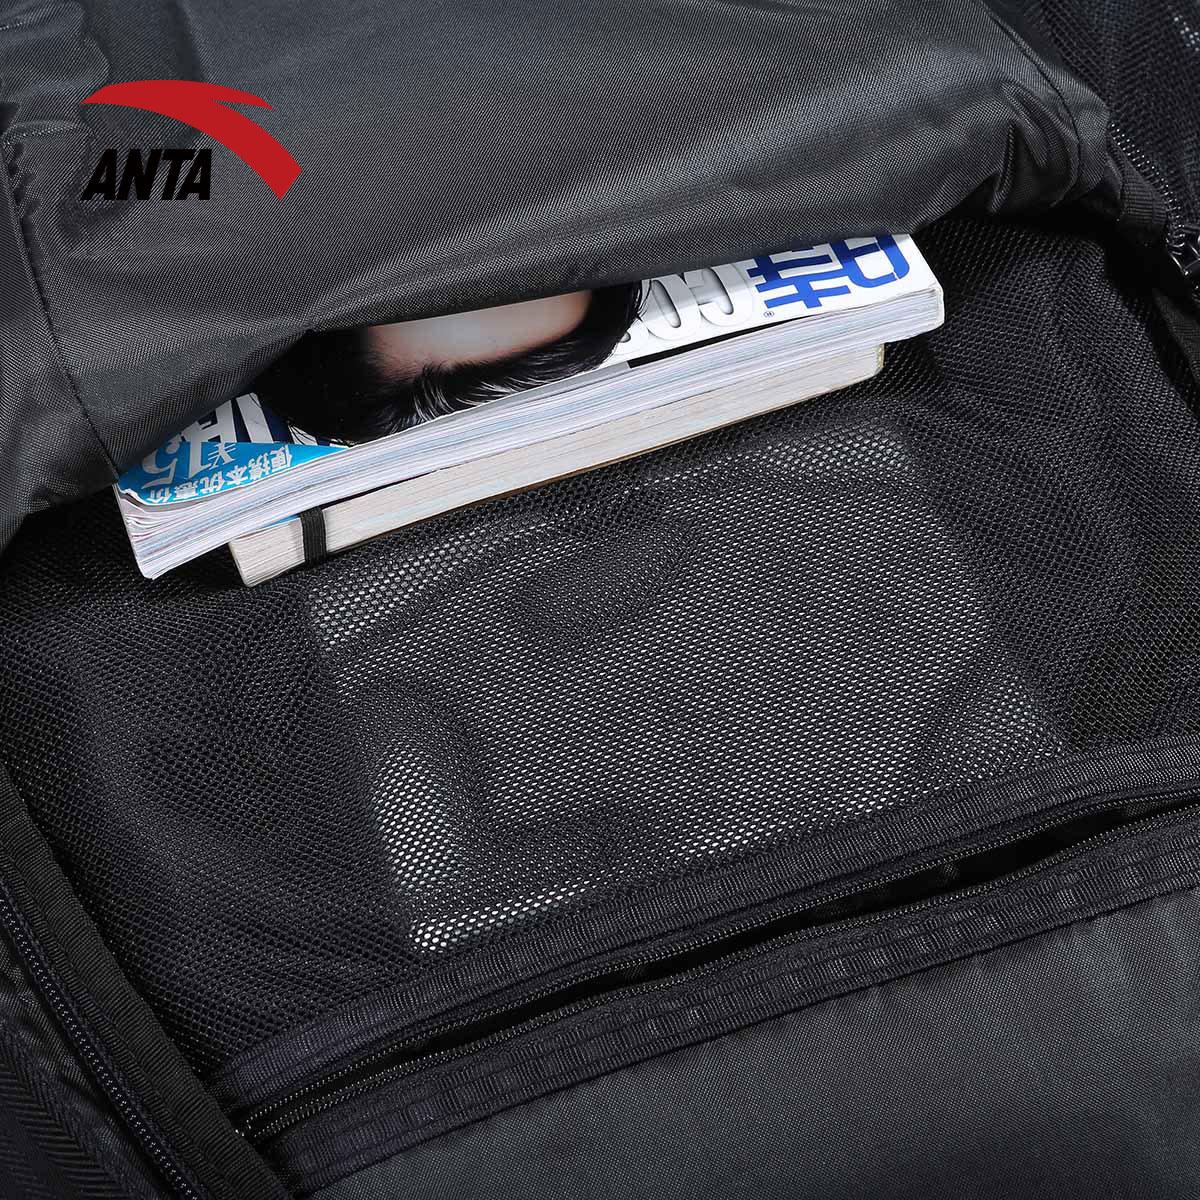 Туристический рюкзак Anta 19441151 2014 Anta / Anta